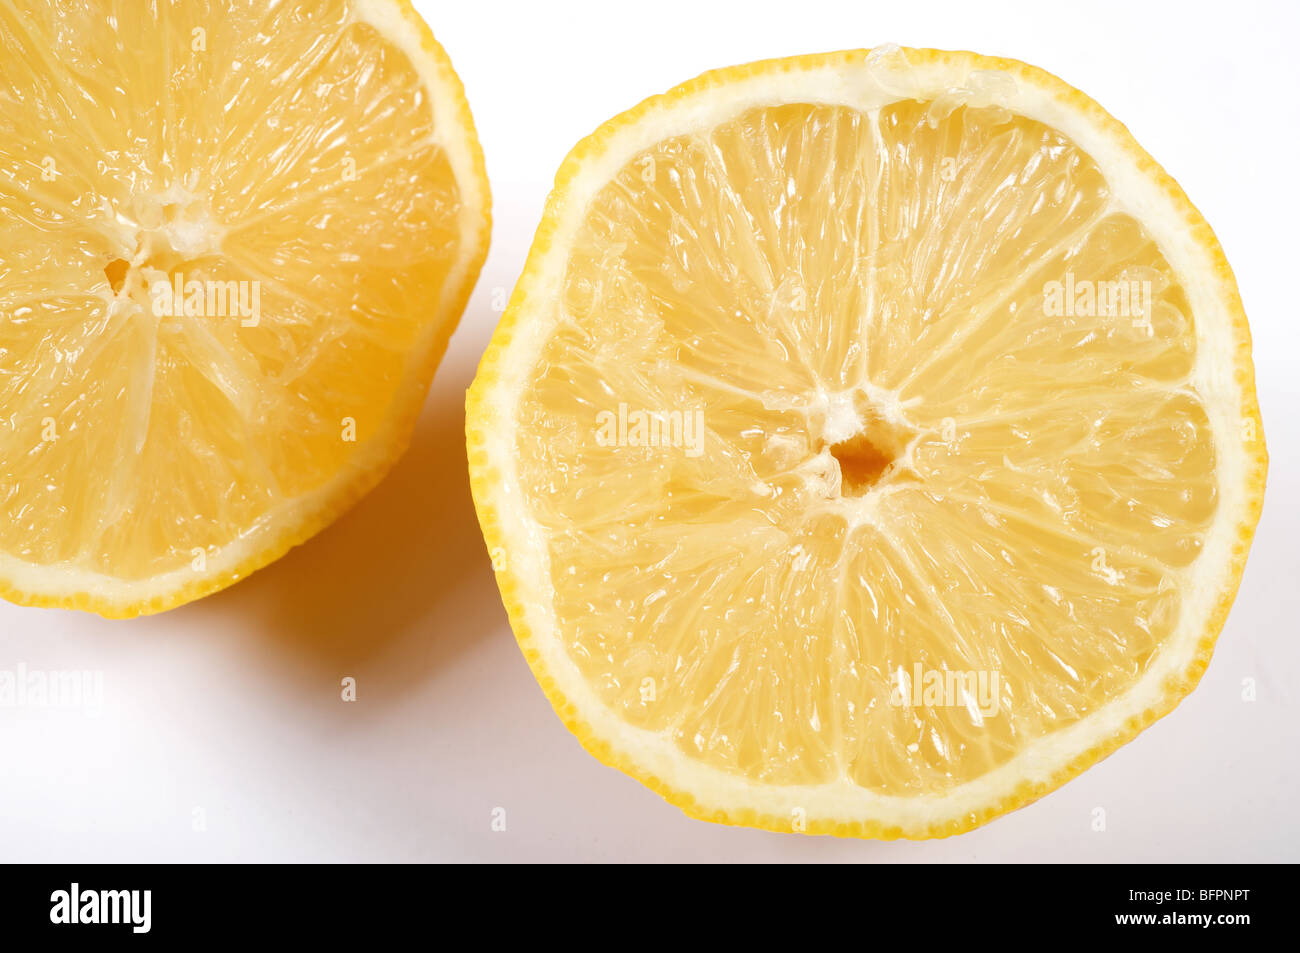 Fresh Lemon cut in two - Stock Image